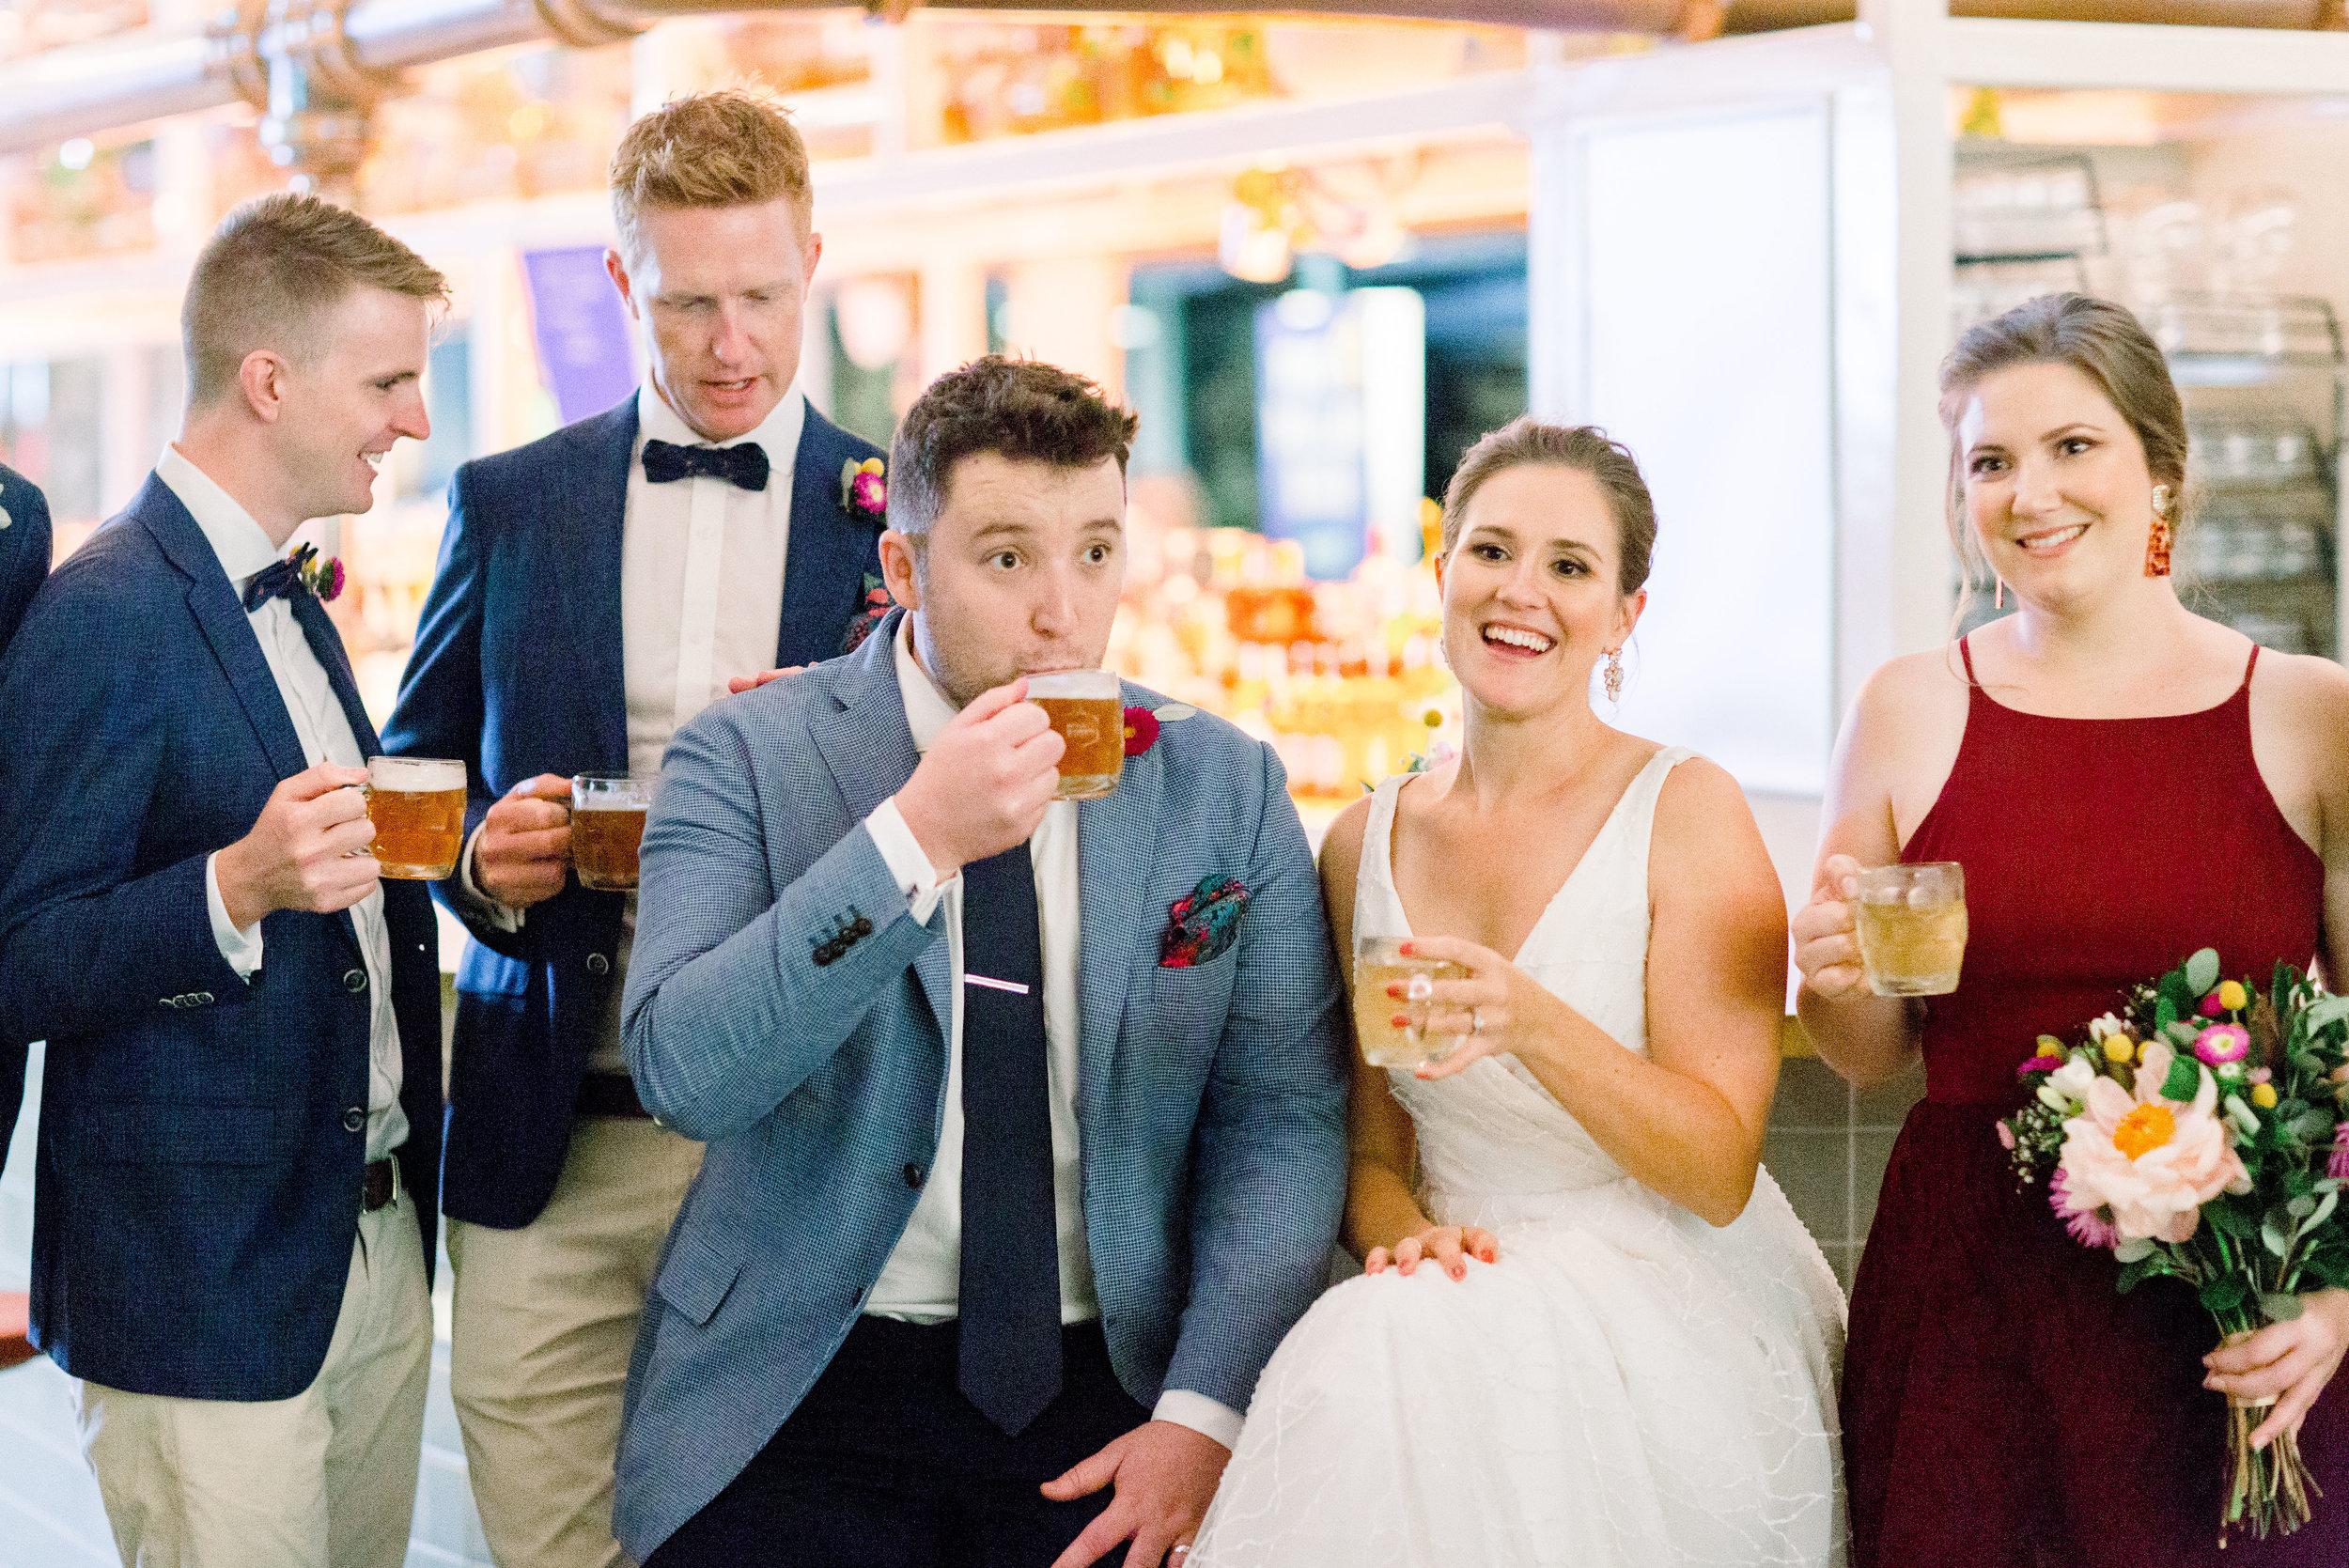 refinery-wedding-brisbane-city-wedding-photographer-80.jpg